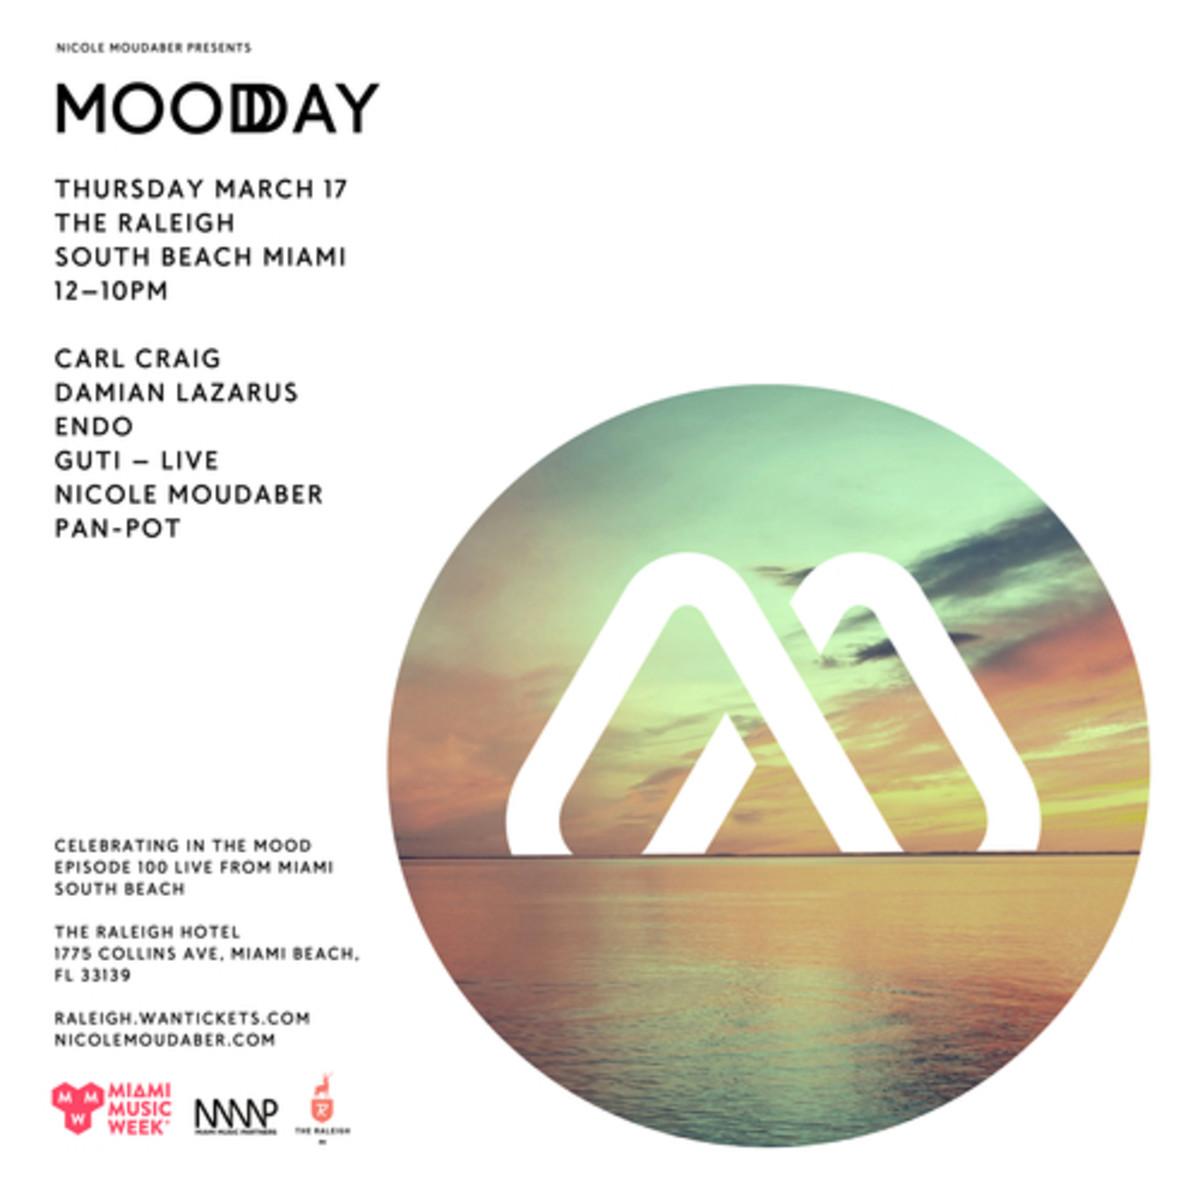 Miami MoodDAY